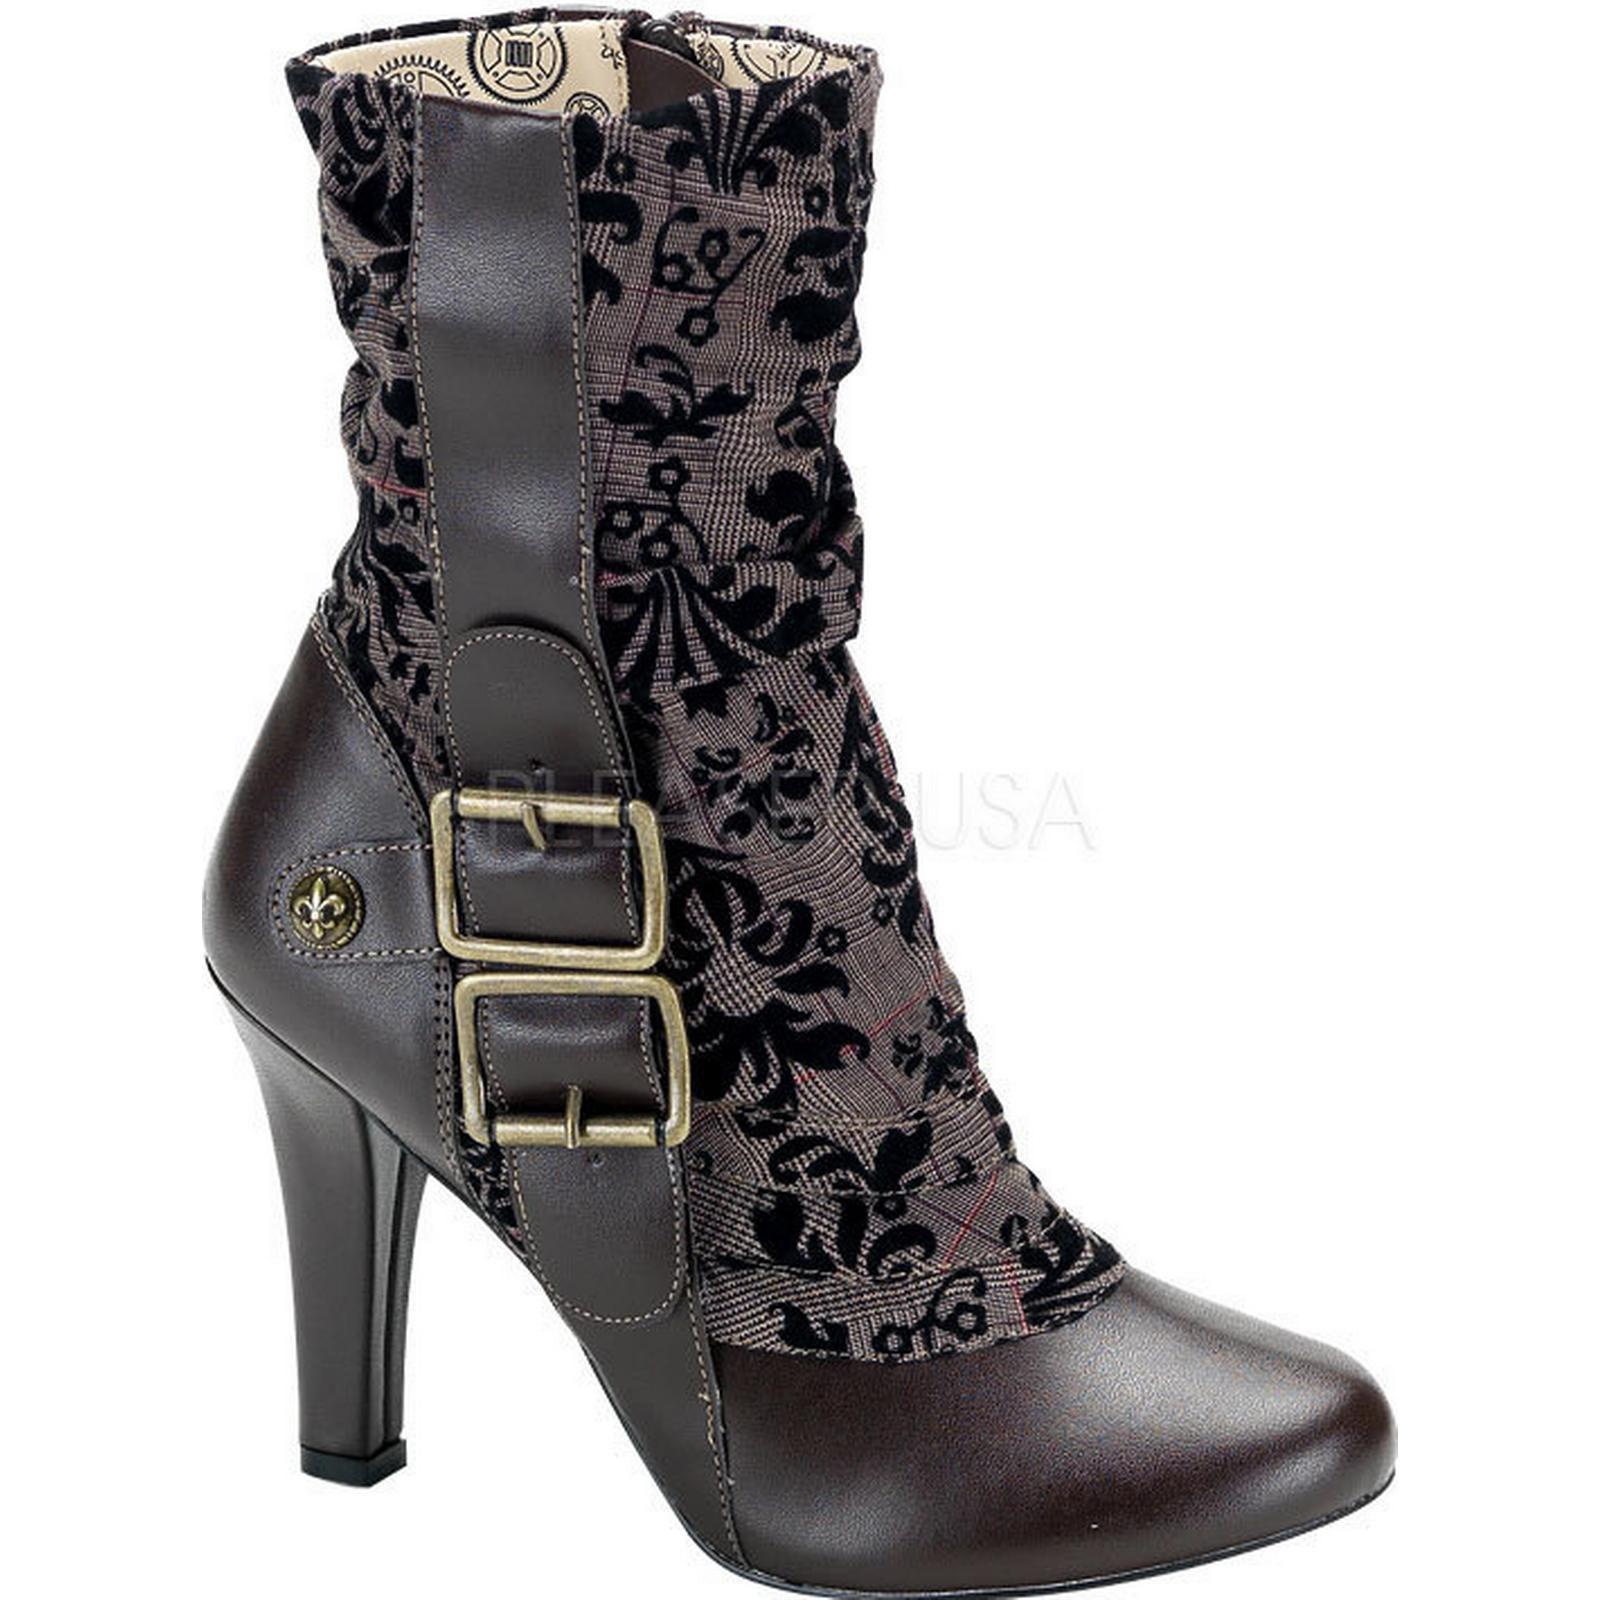 Costume-Ladies Steampunk Calf - Boots - Calf UK-9, EURO-42, US-12 1c47b8